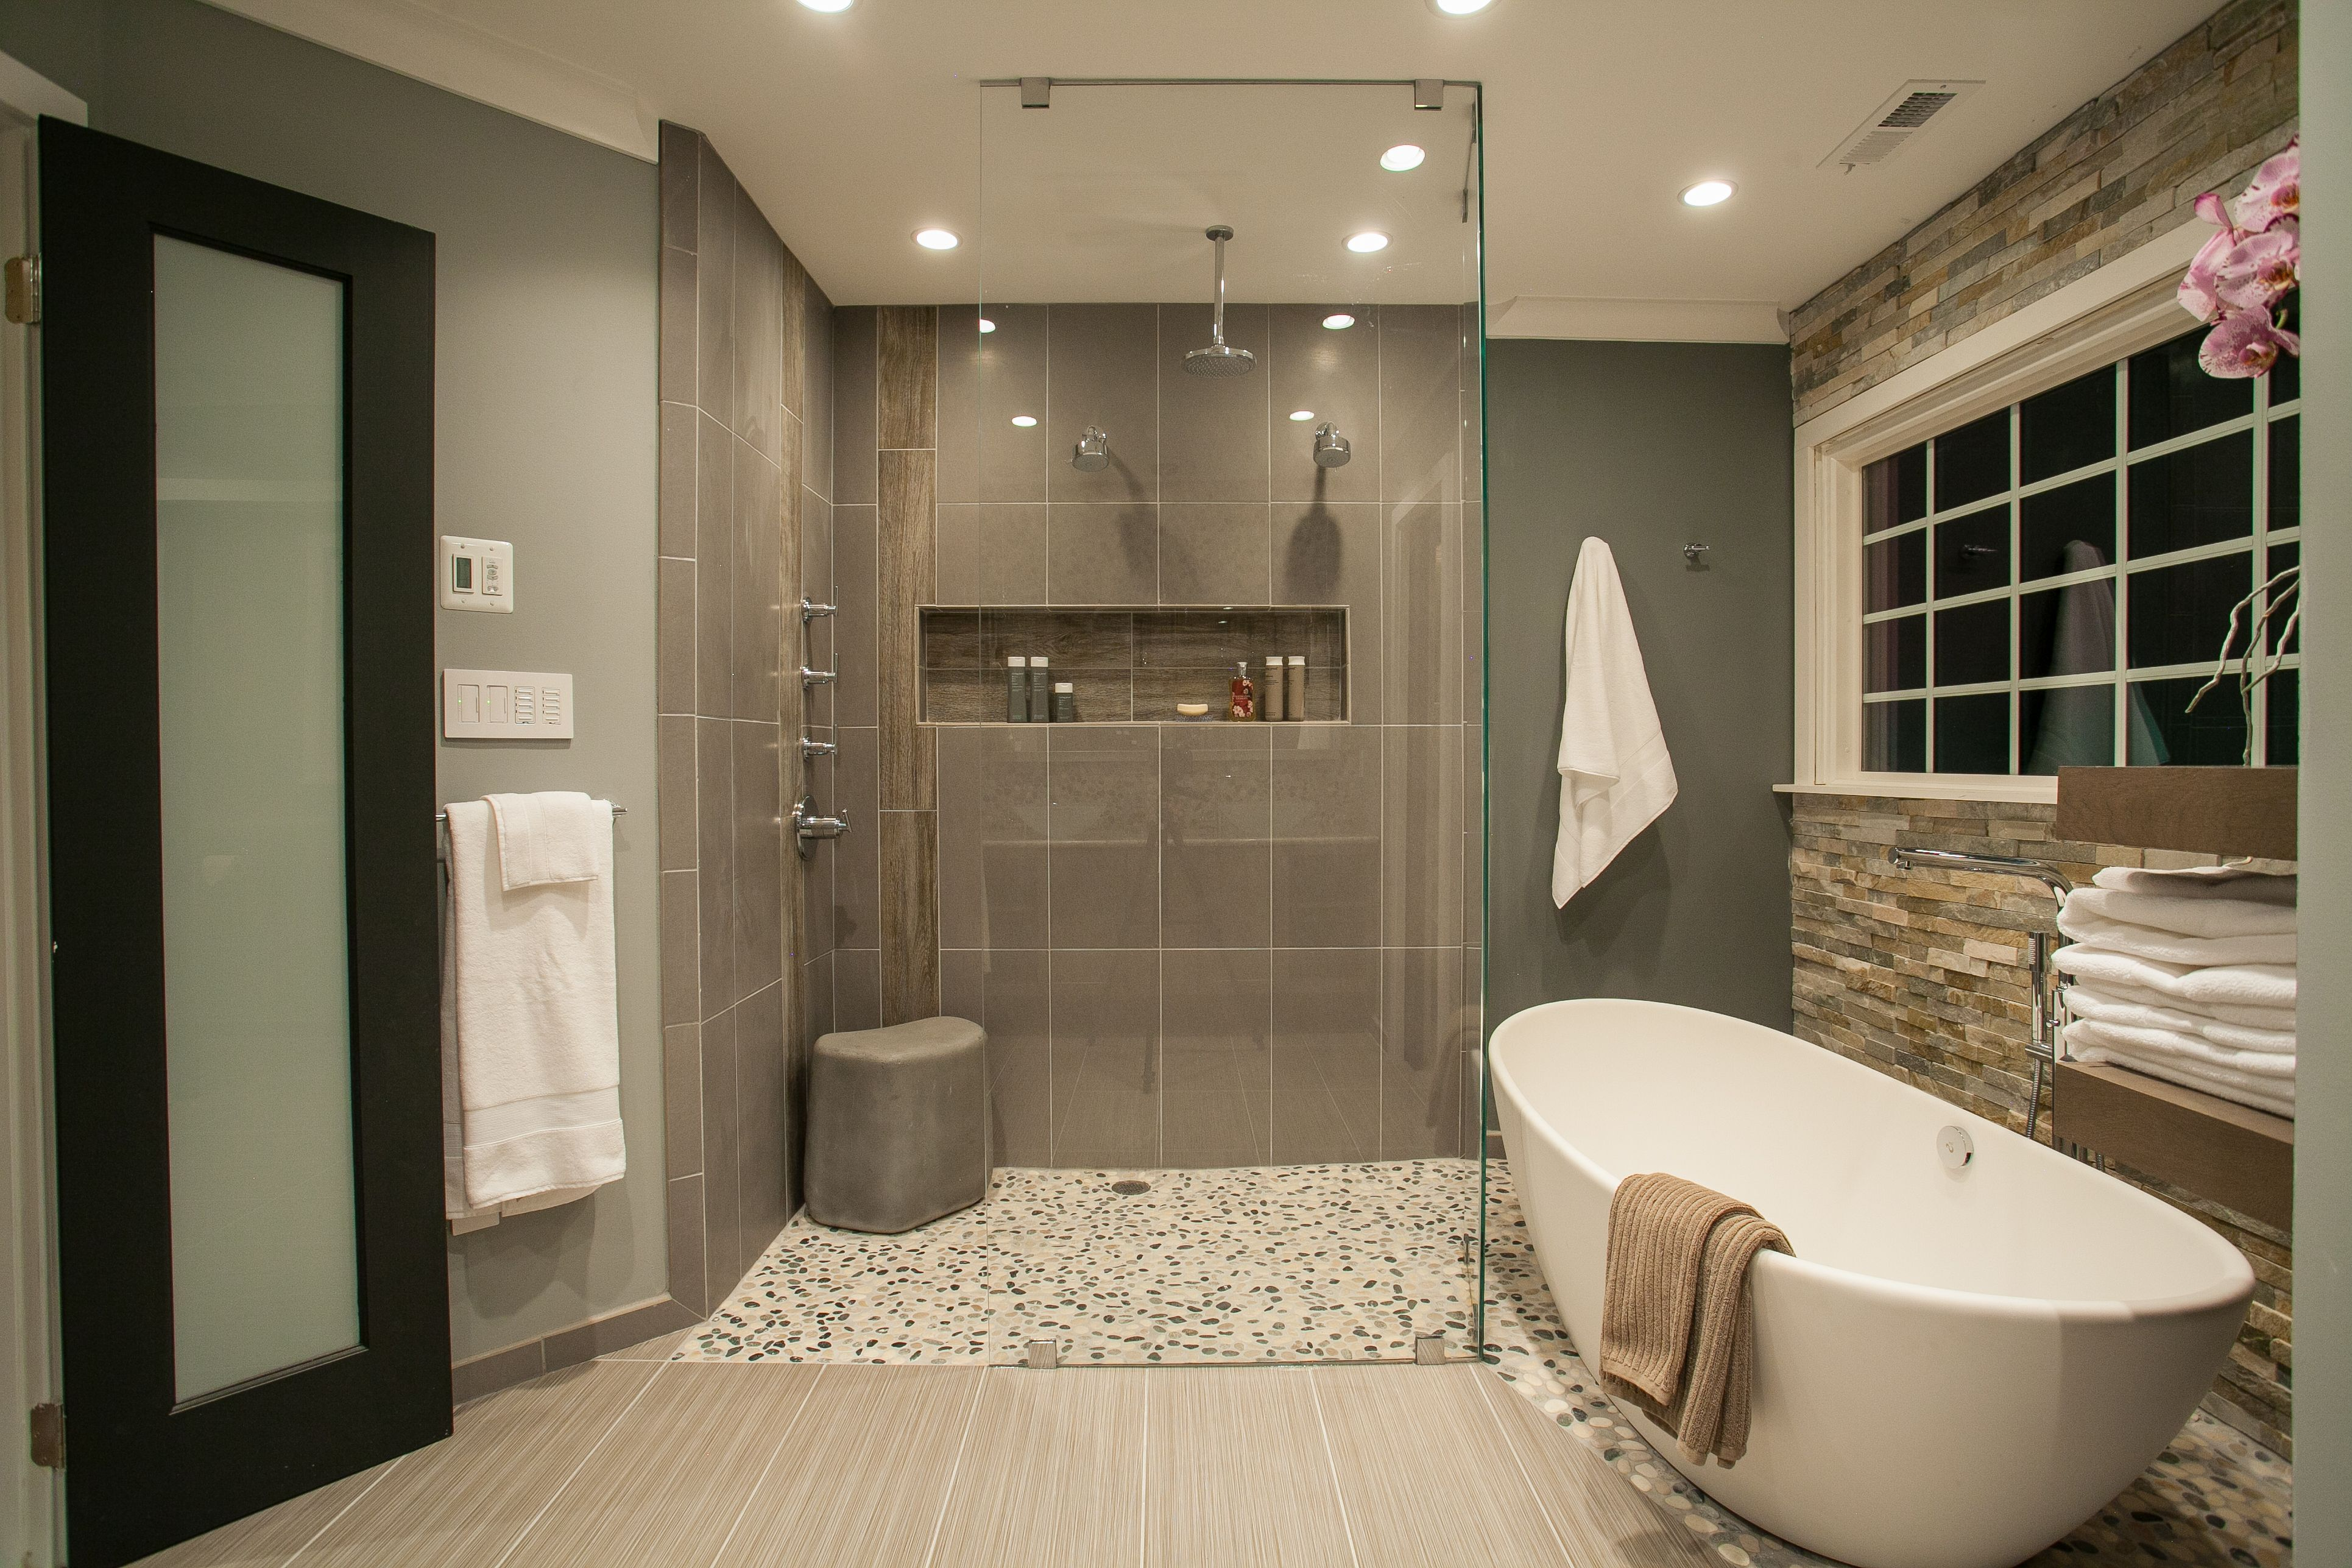 6 Design Ideas For Spa Like Bathrooms Small Spa Bathroom Spa